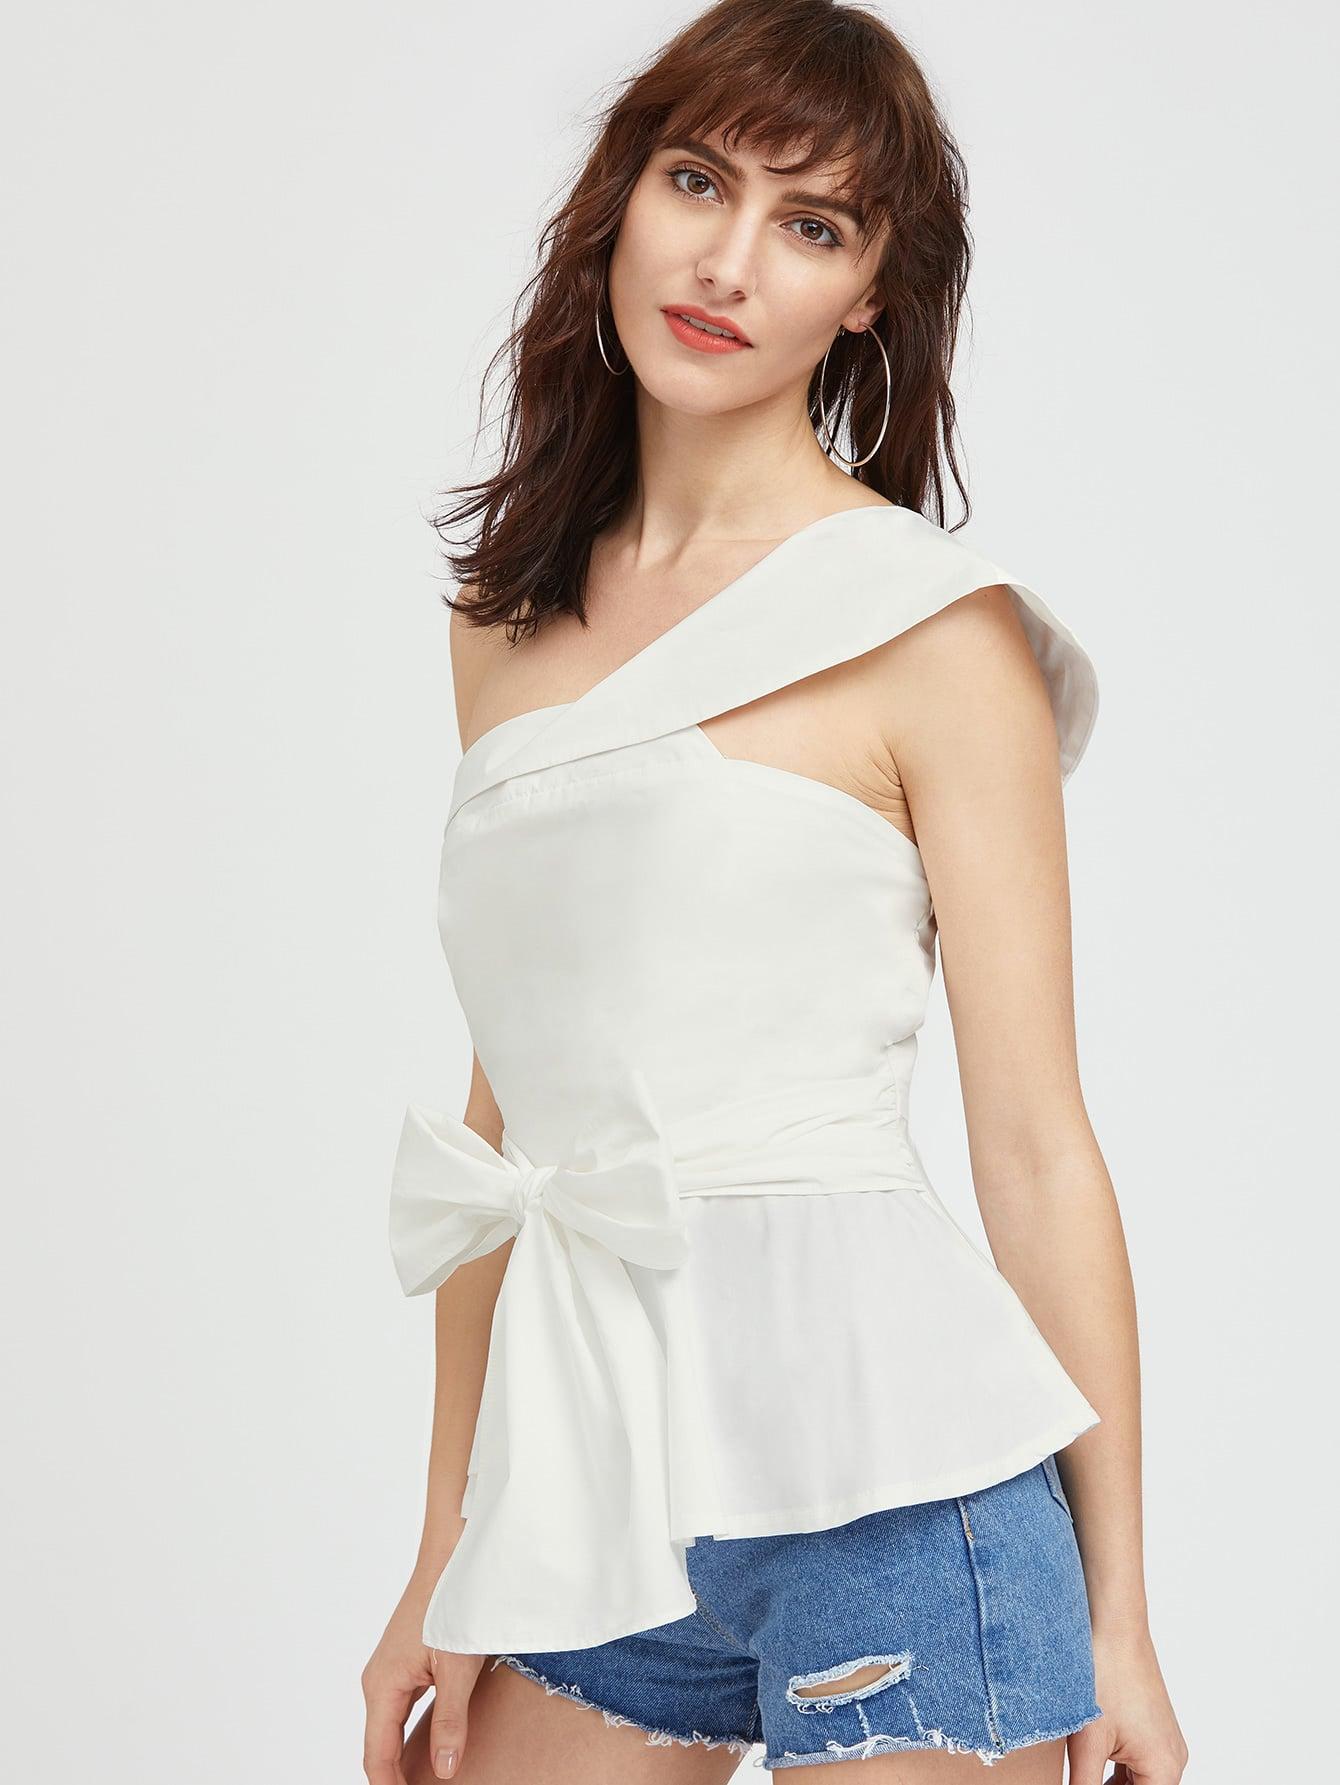 blouse170331451_2